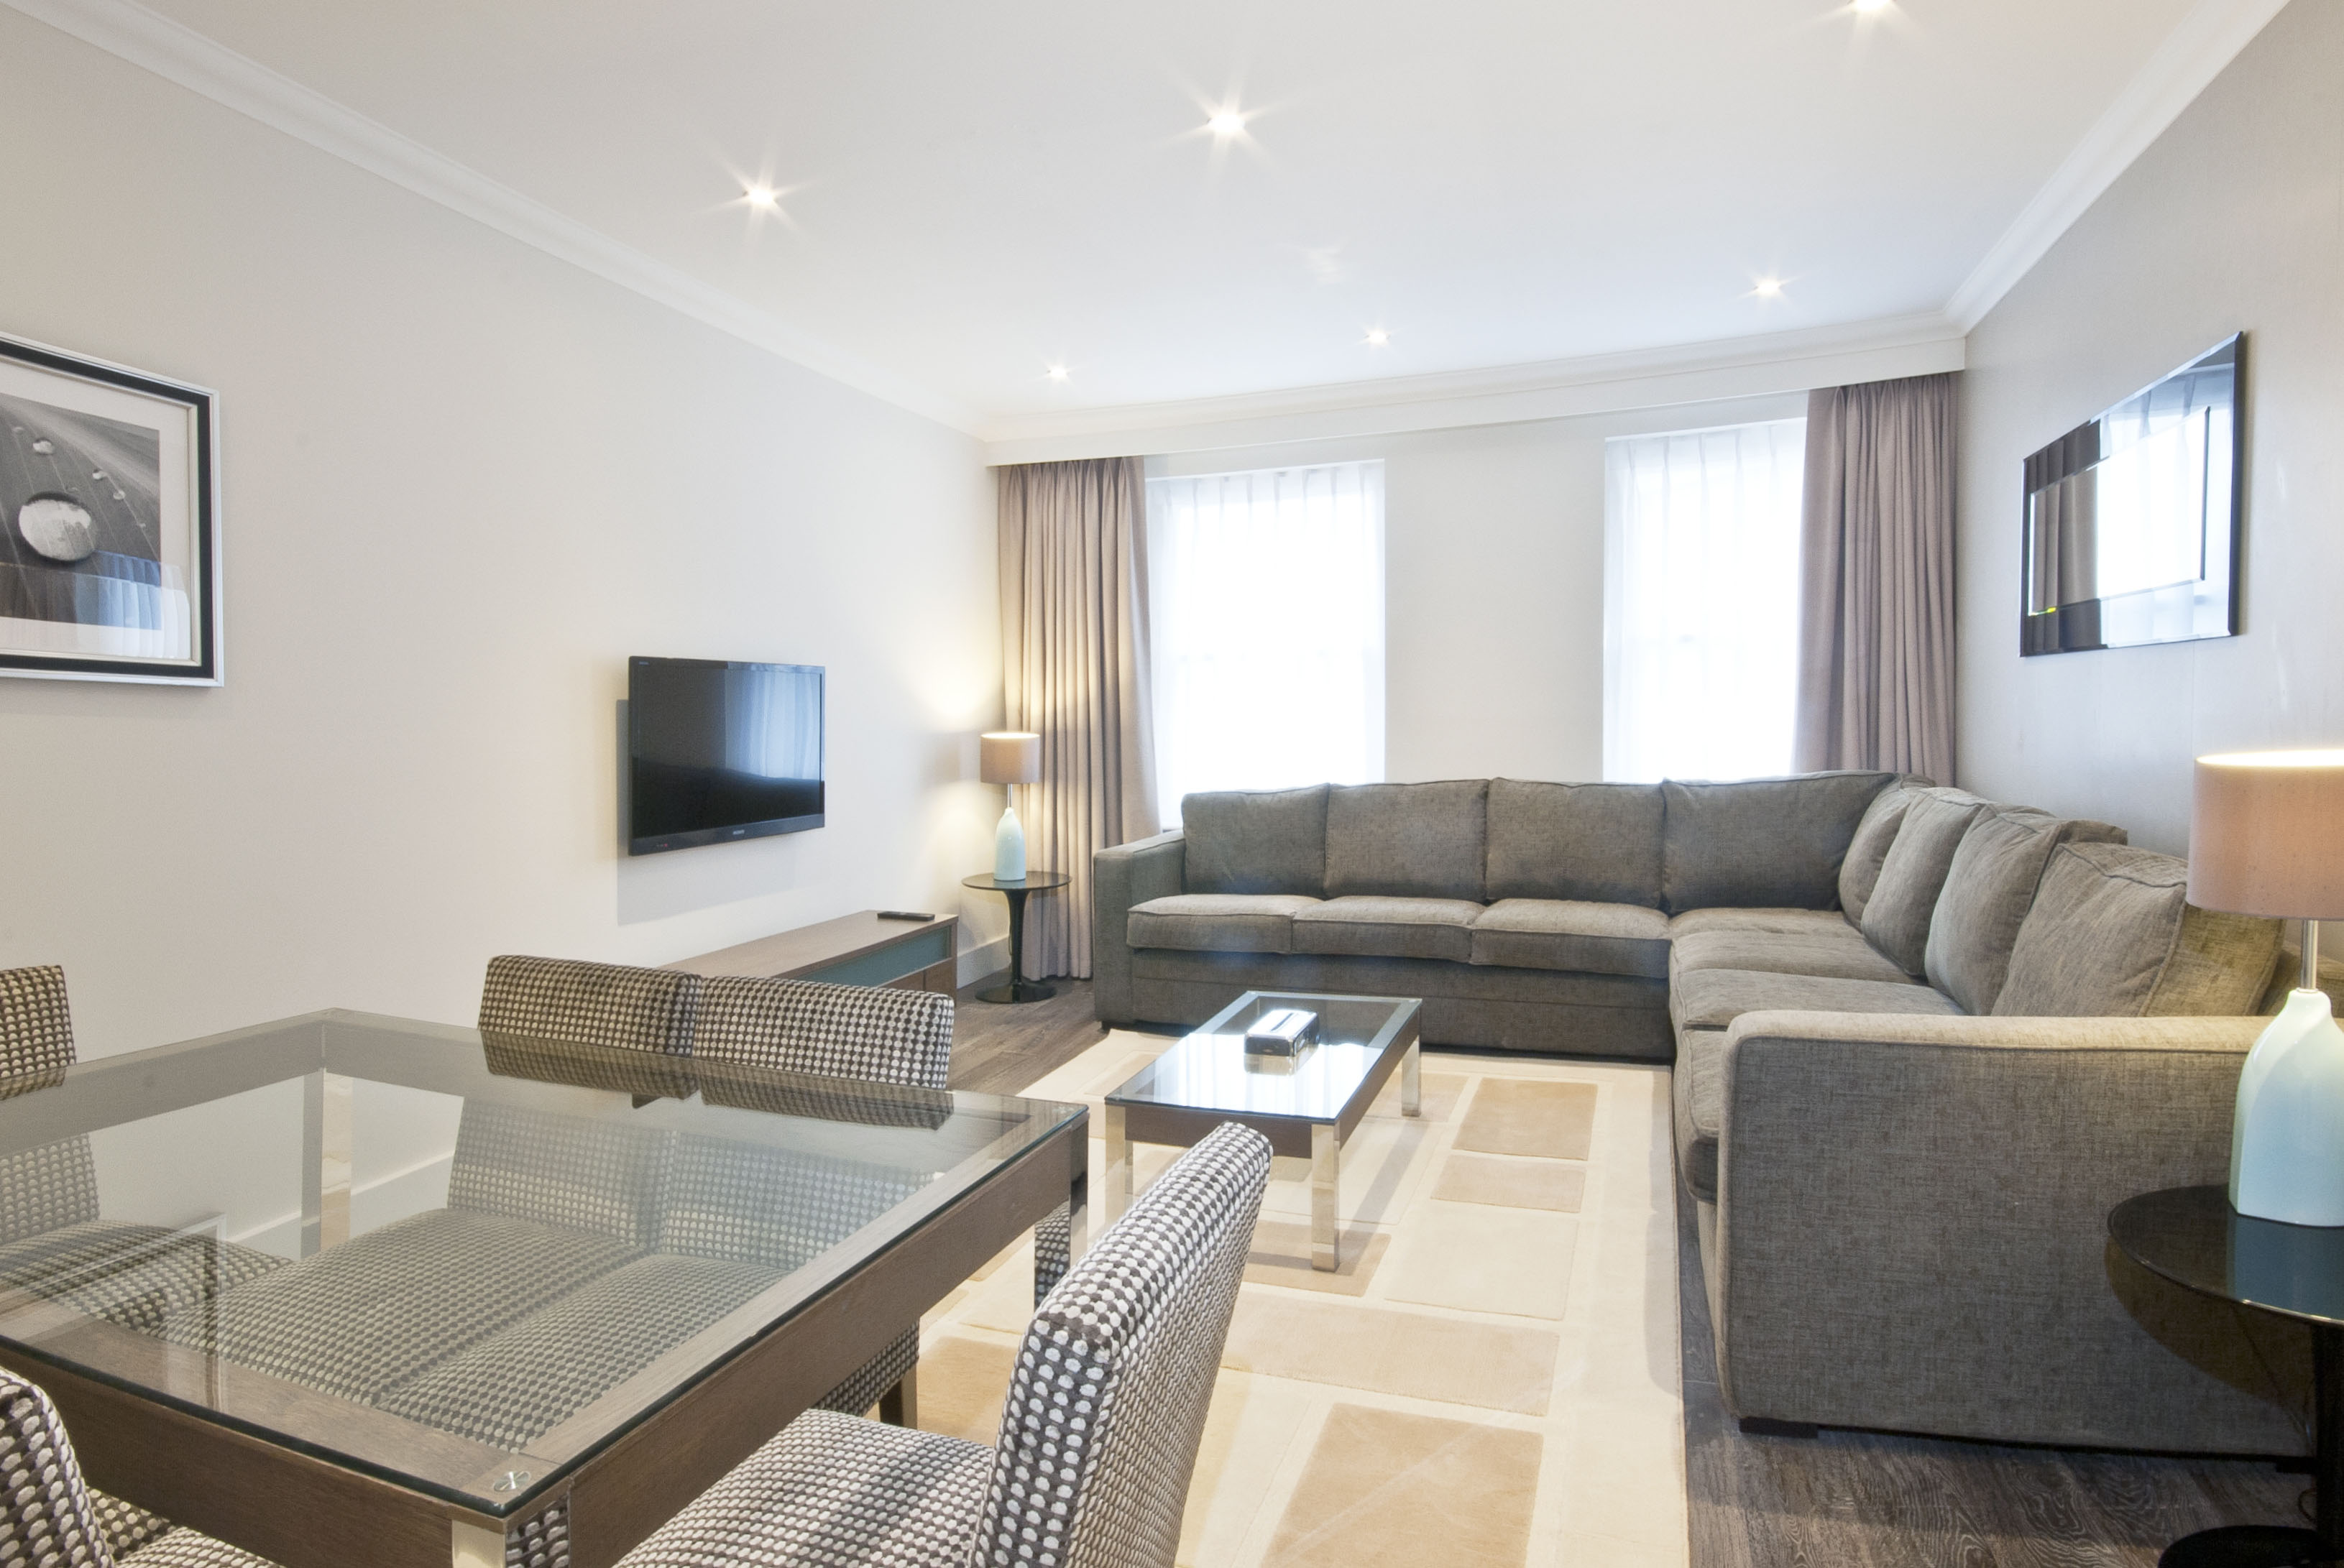 401 - two bedroom - Deluxe - Living - dinning room .jpg